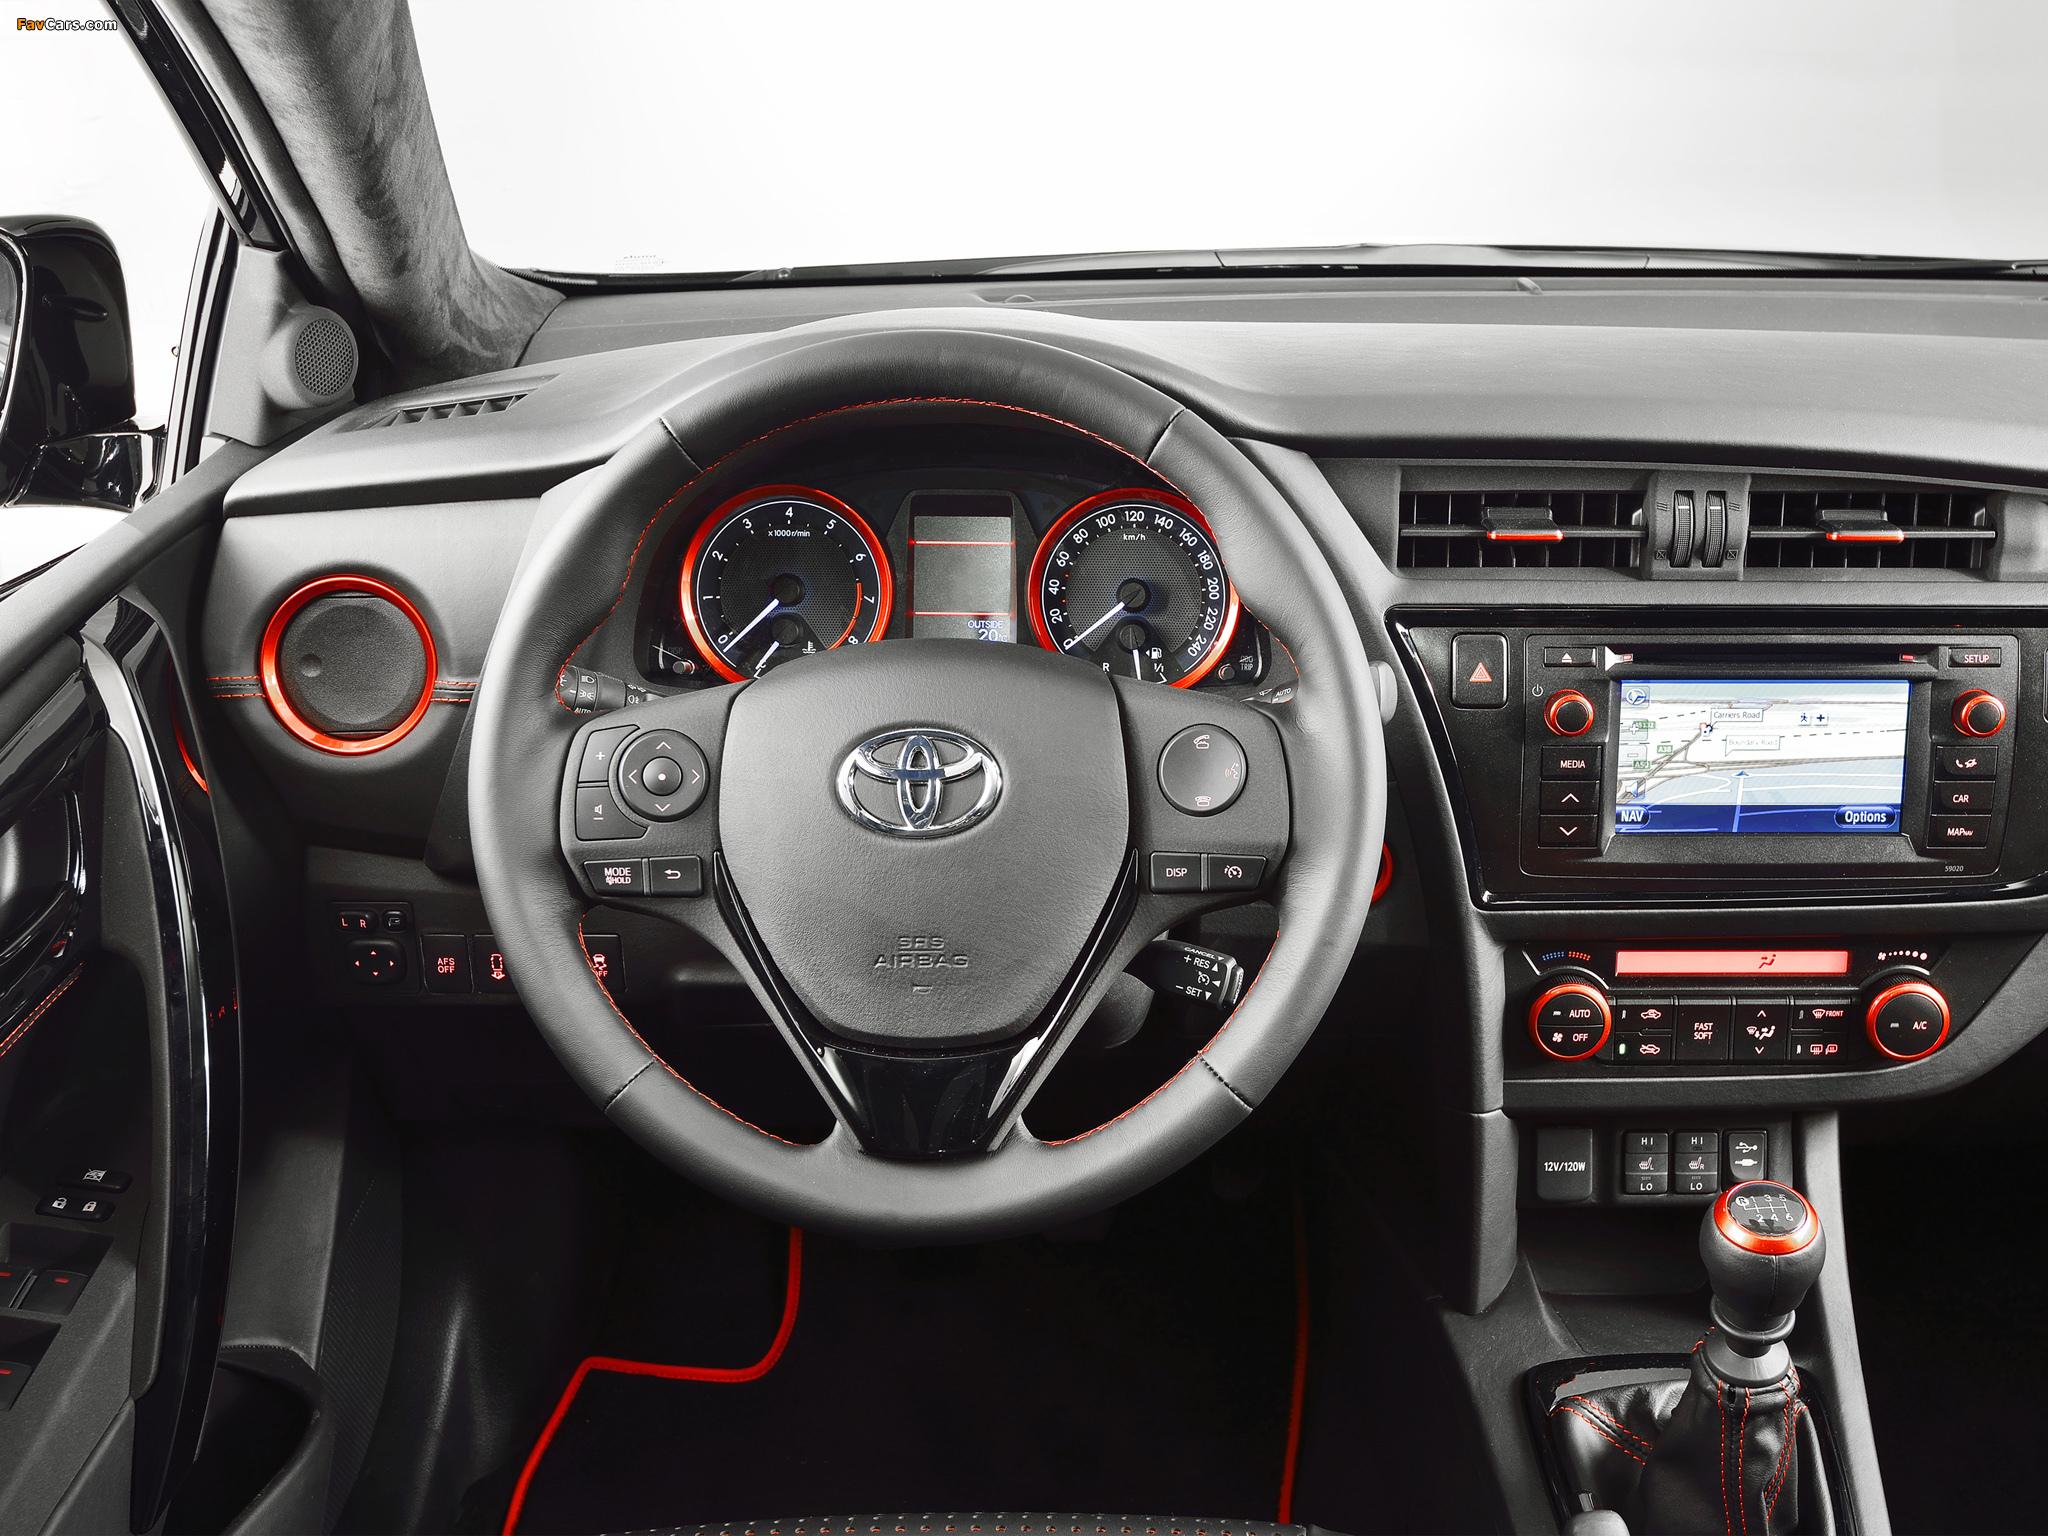 Toyota Auris Touring Sports Black Concept 2013 photos (2048 x 1536)